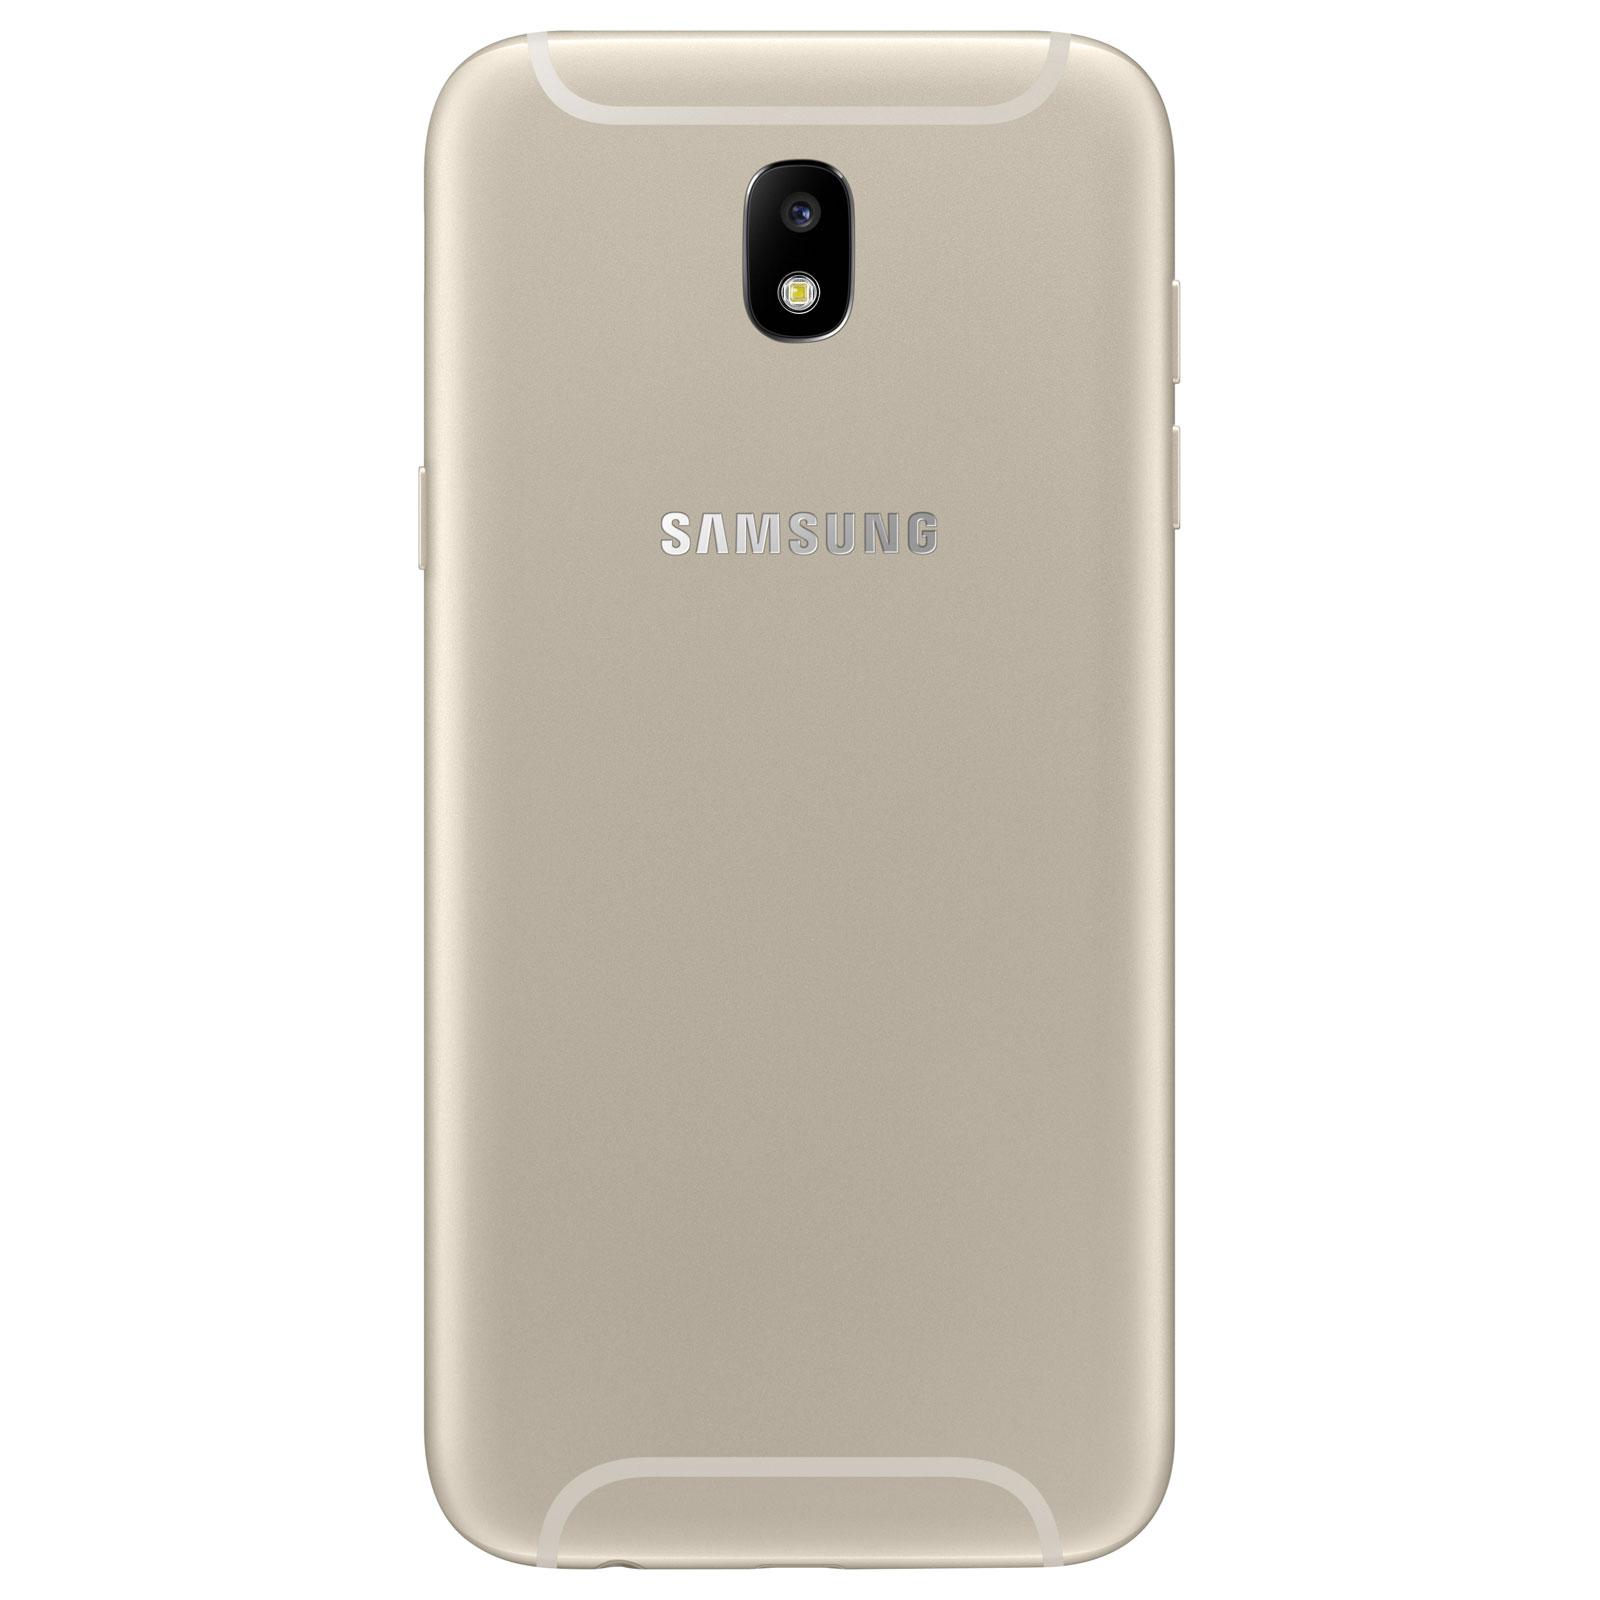 Samsung Galaxy J5 (2017) 16Go J530 Gold (SM-J530FZDAXEF) - Achat / Vente Téléphonie sur Cybertek.fr - 1